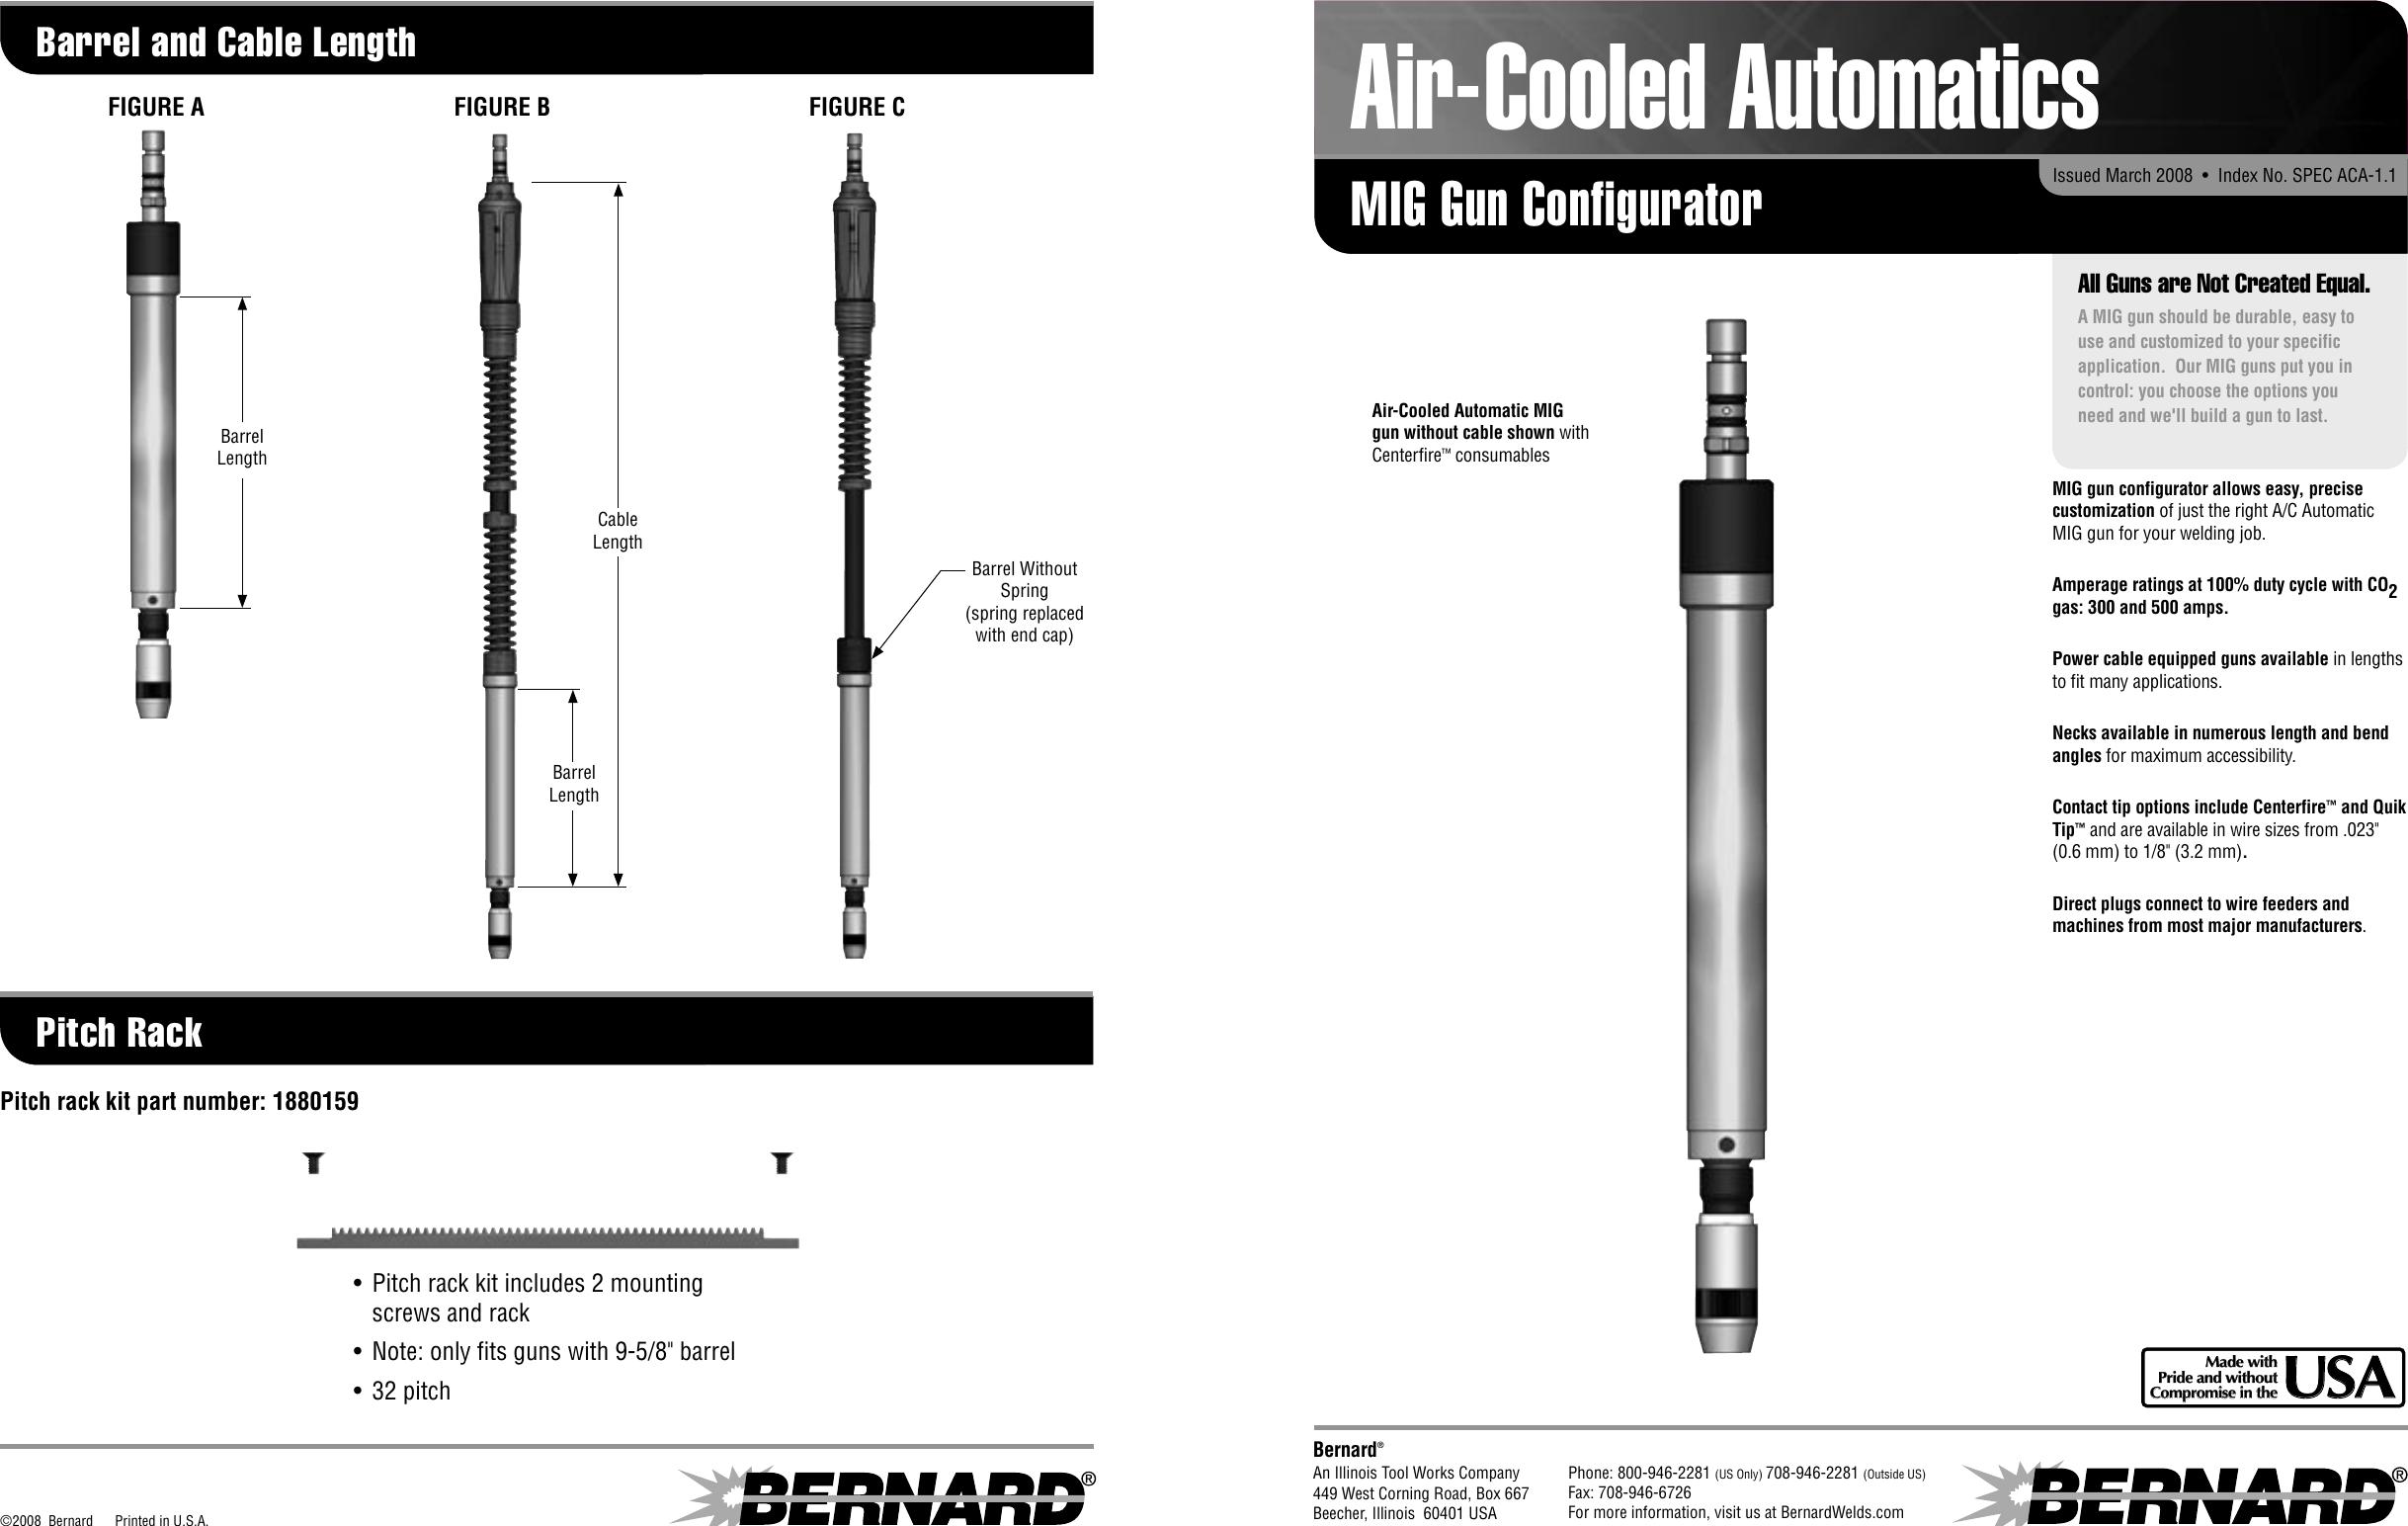 Bernard Mig Gun Configurator Users Manual